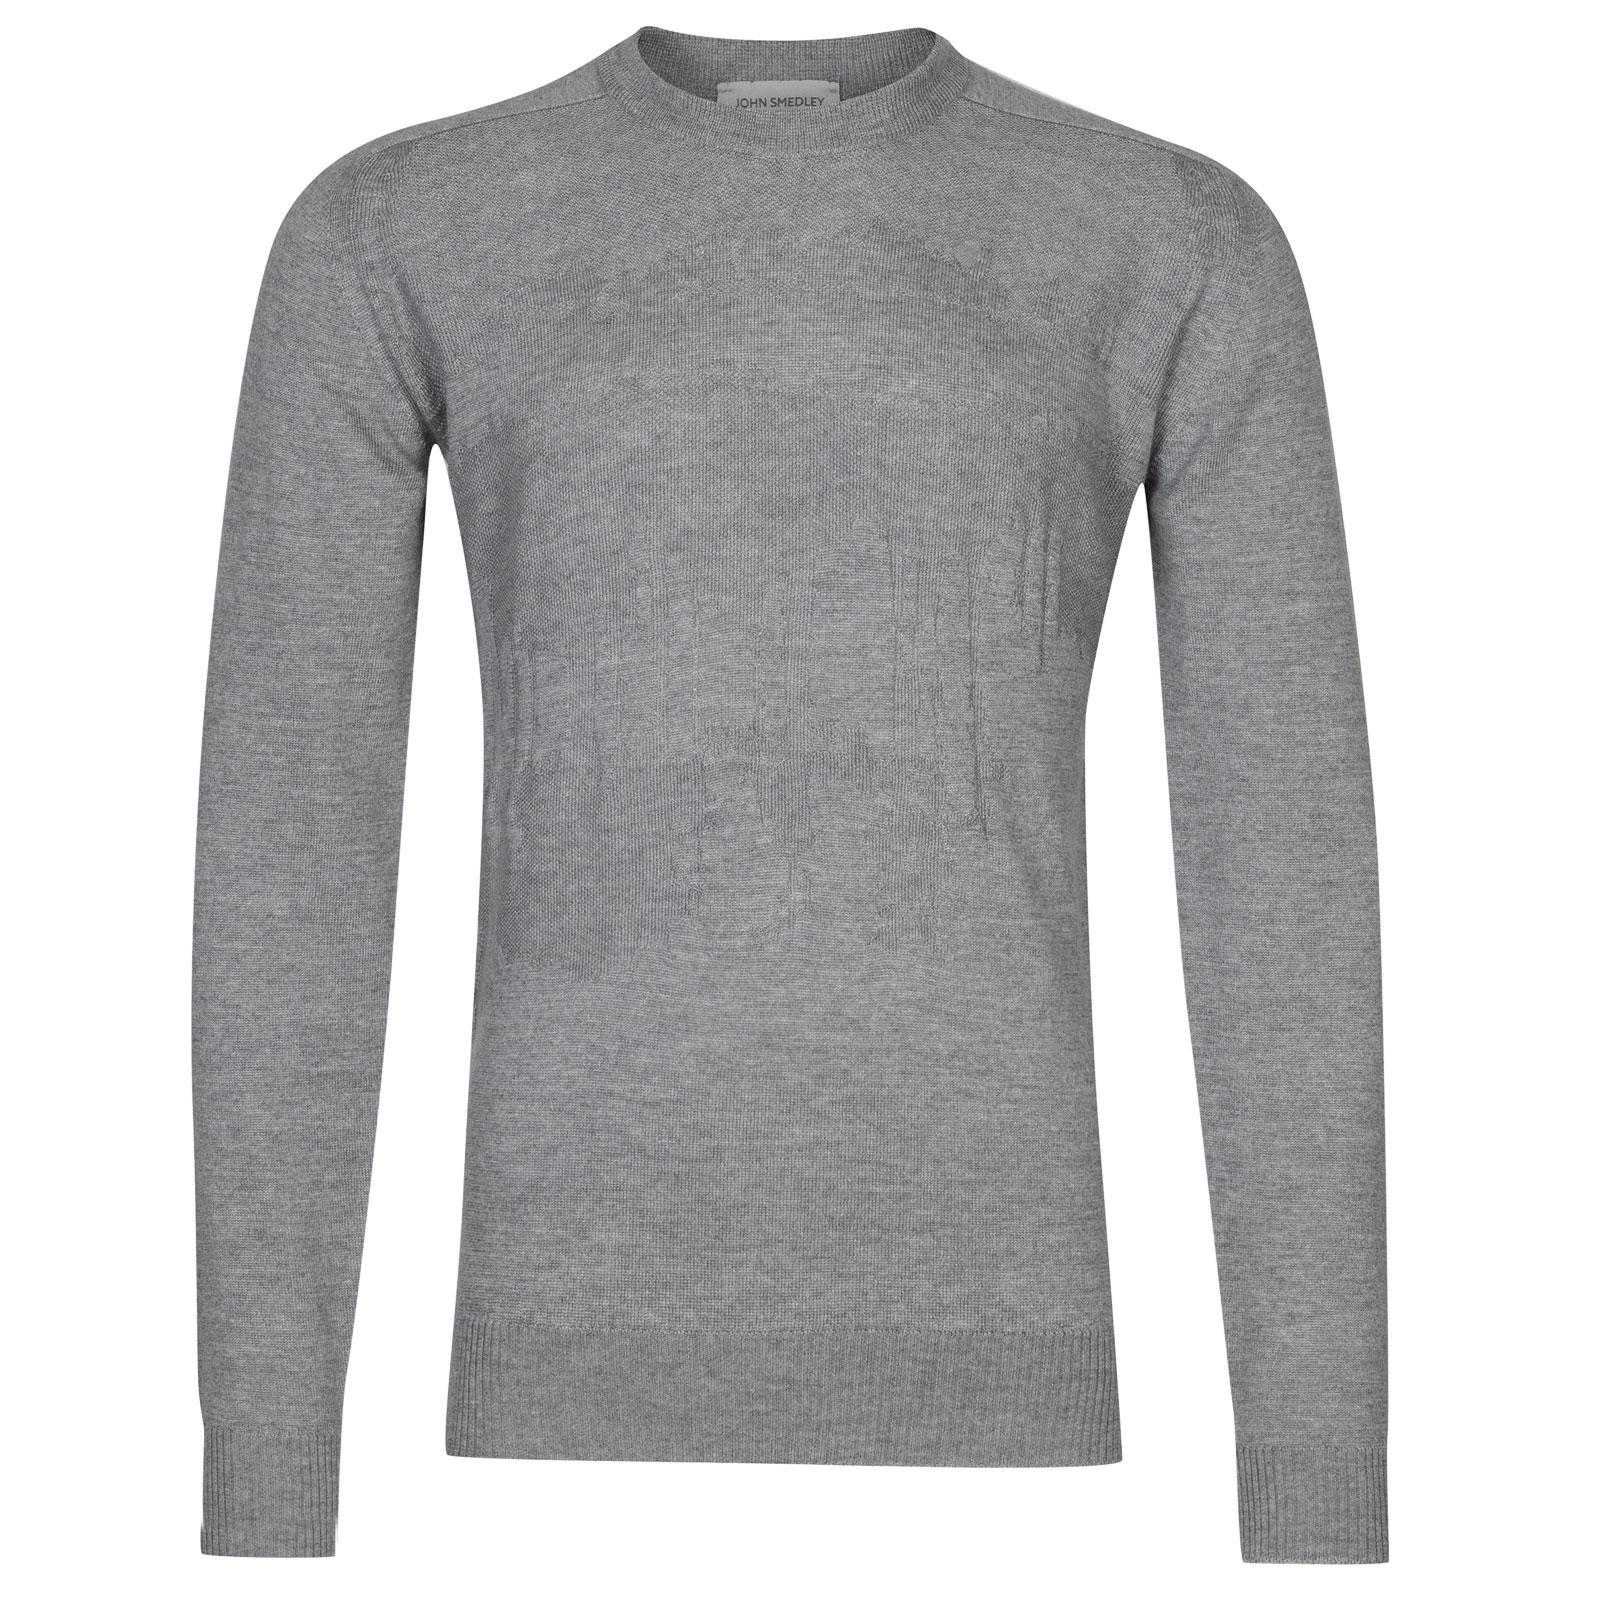 John Smedley sorbus Merino Wool Pullover in Silver-XXL